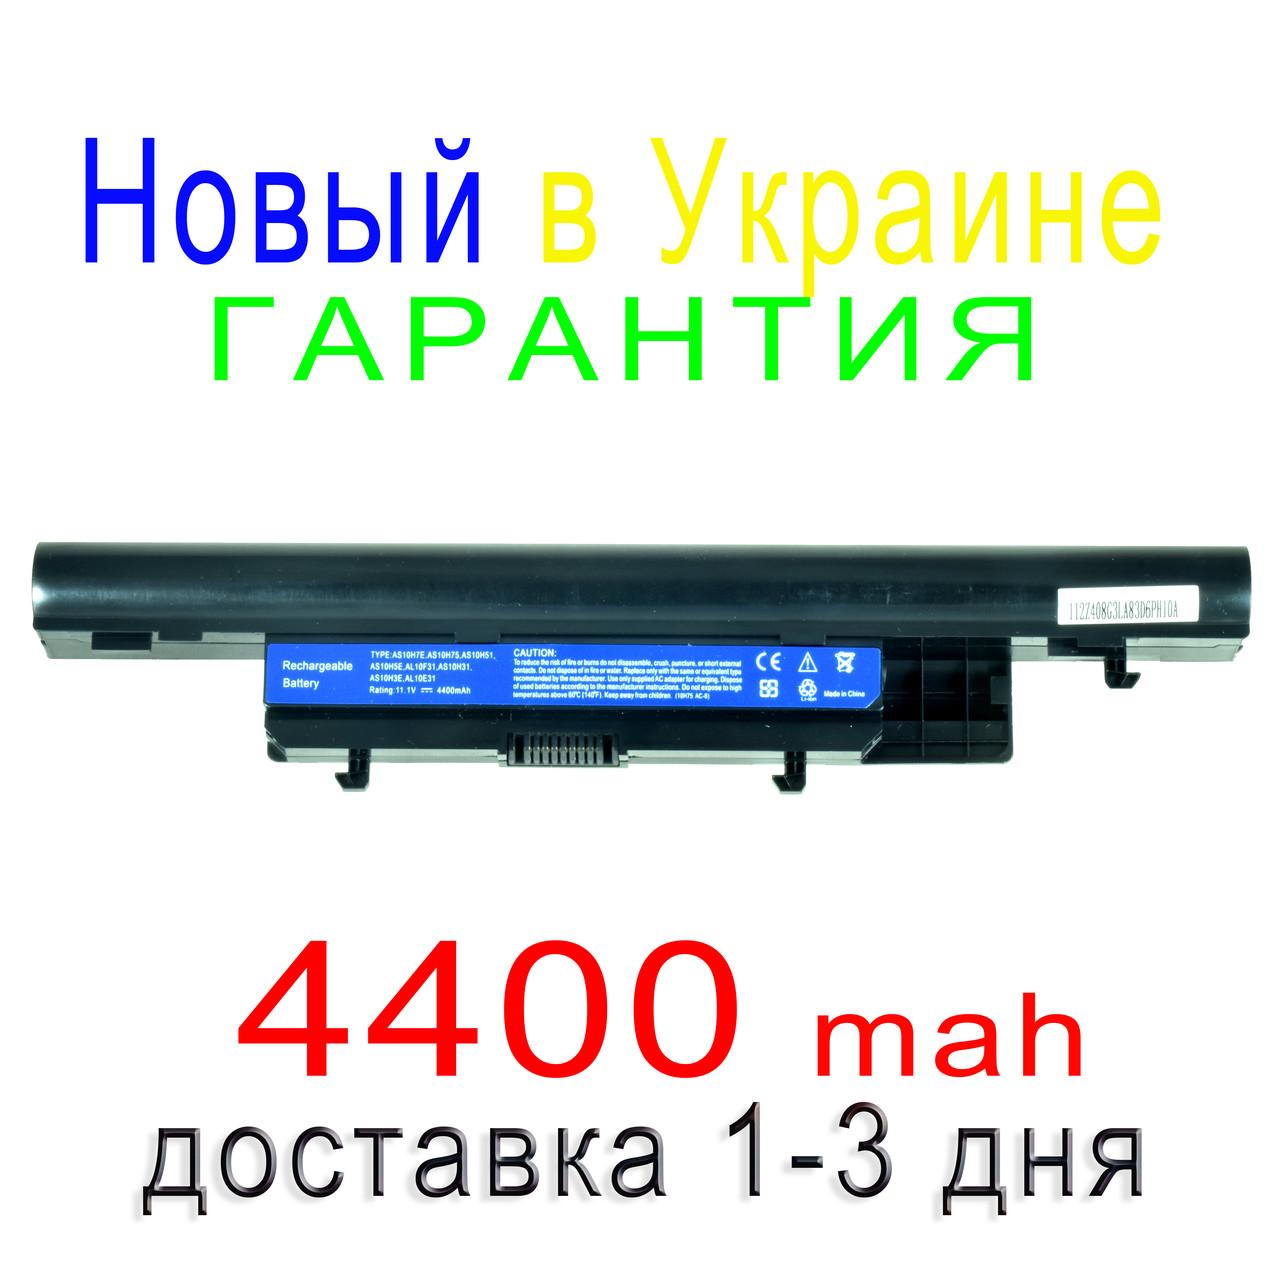 Аккумулятор батарея Gateway EC39C EC39C01c EC39C01u EC39C01w EC39C-N52B EC49C EC49C06w ID53A ID59C